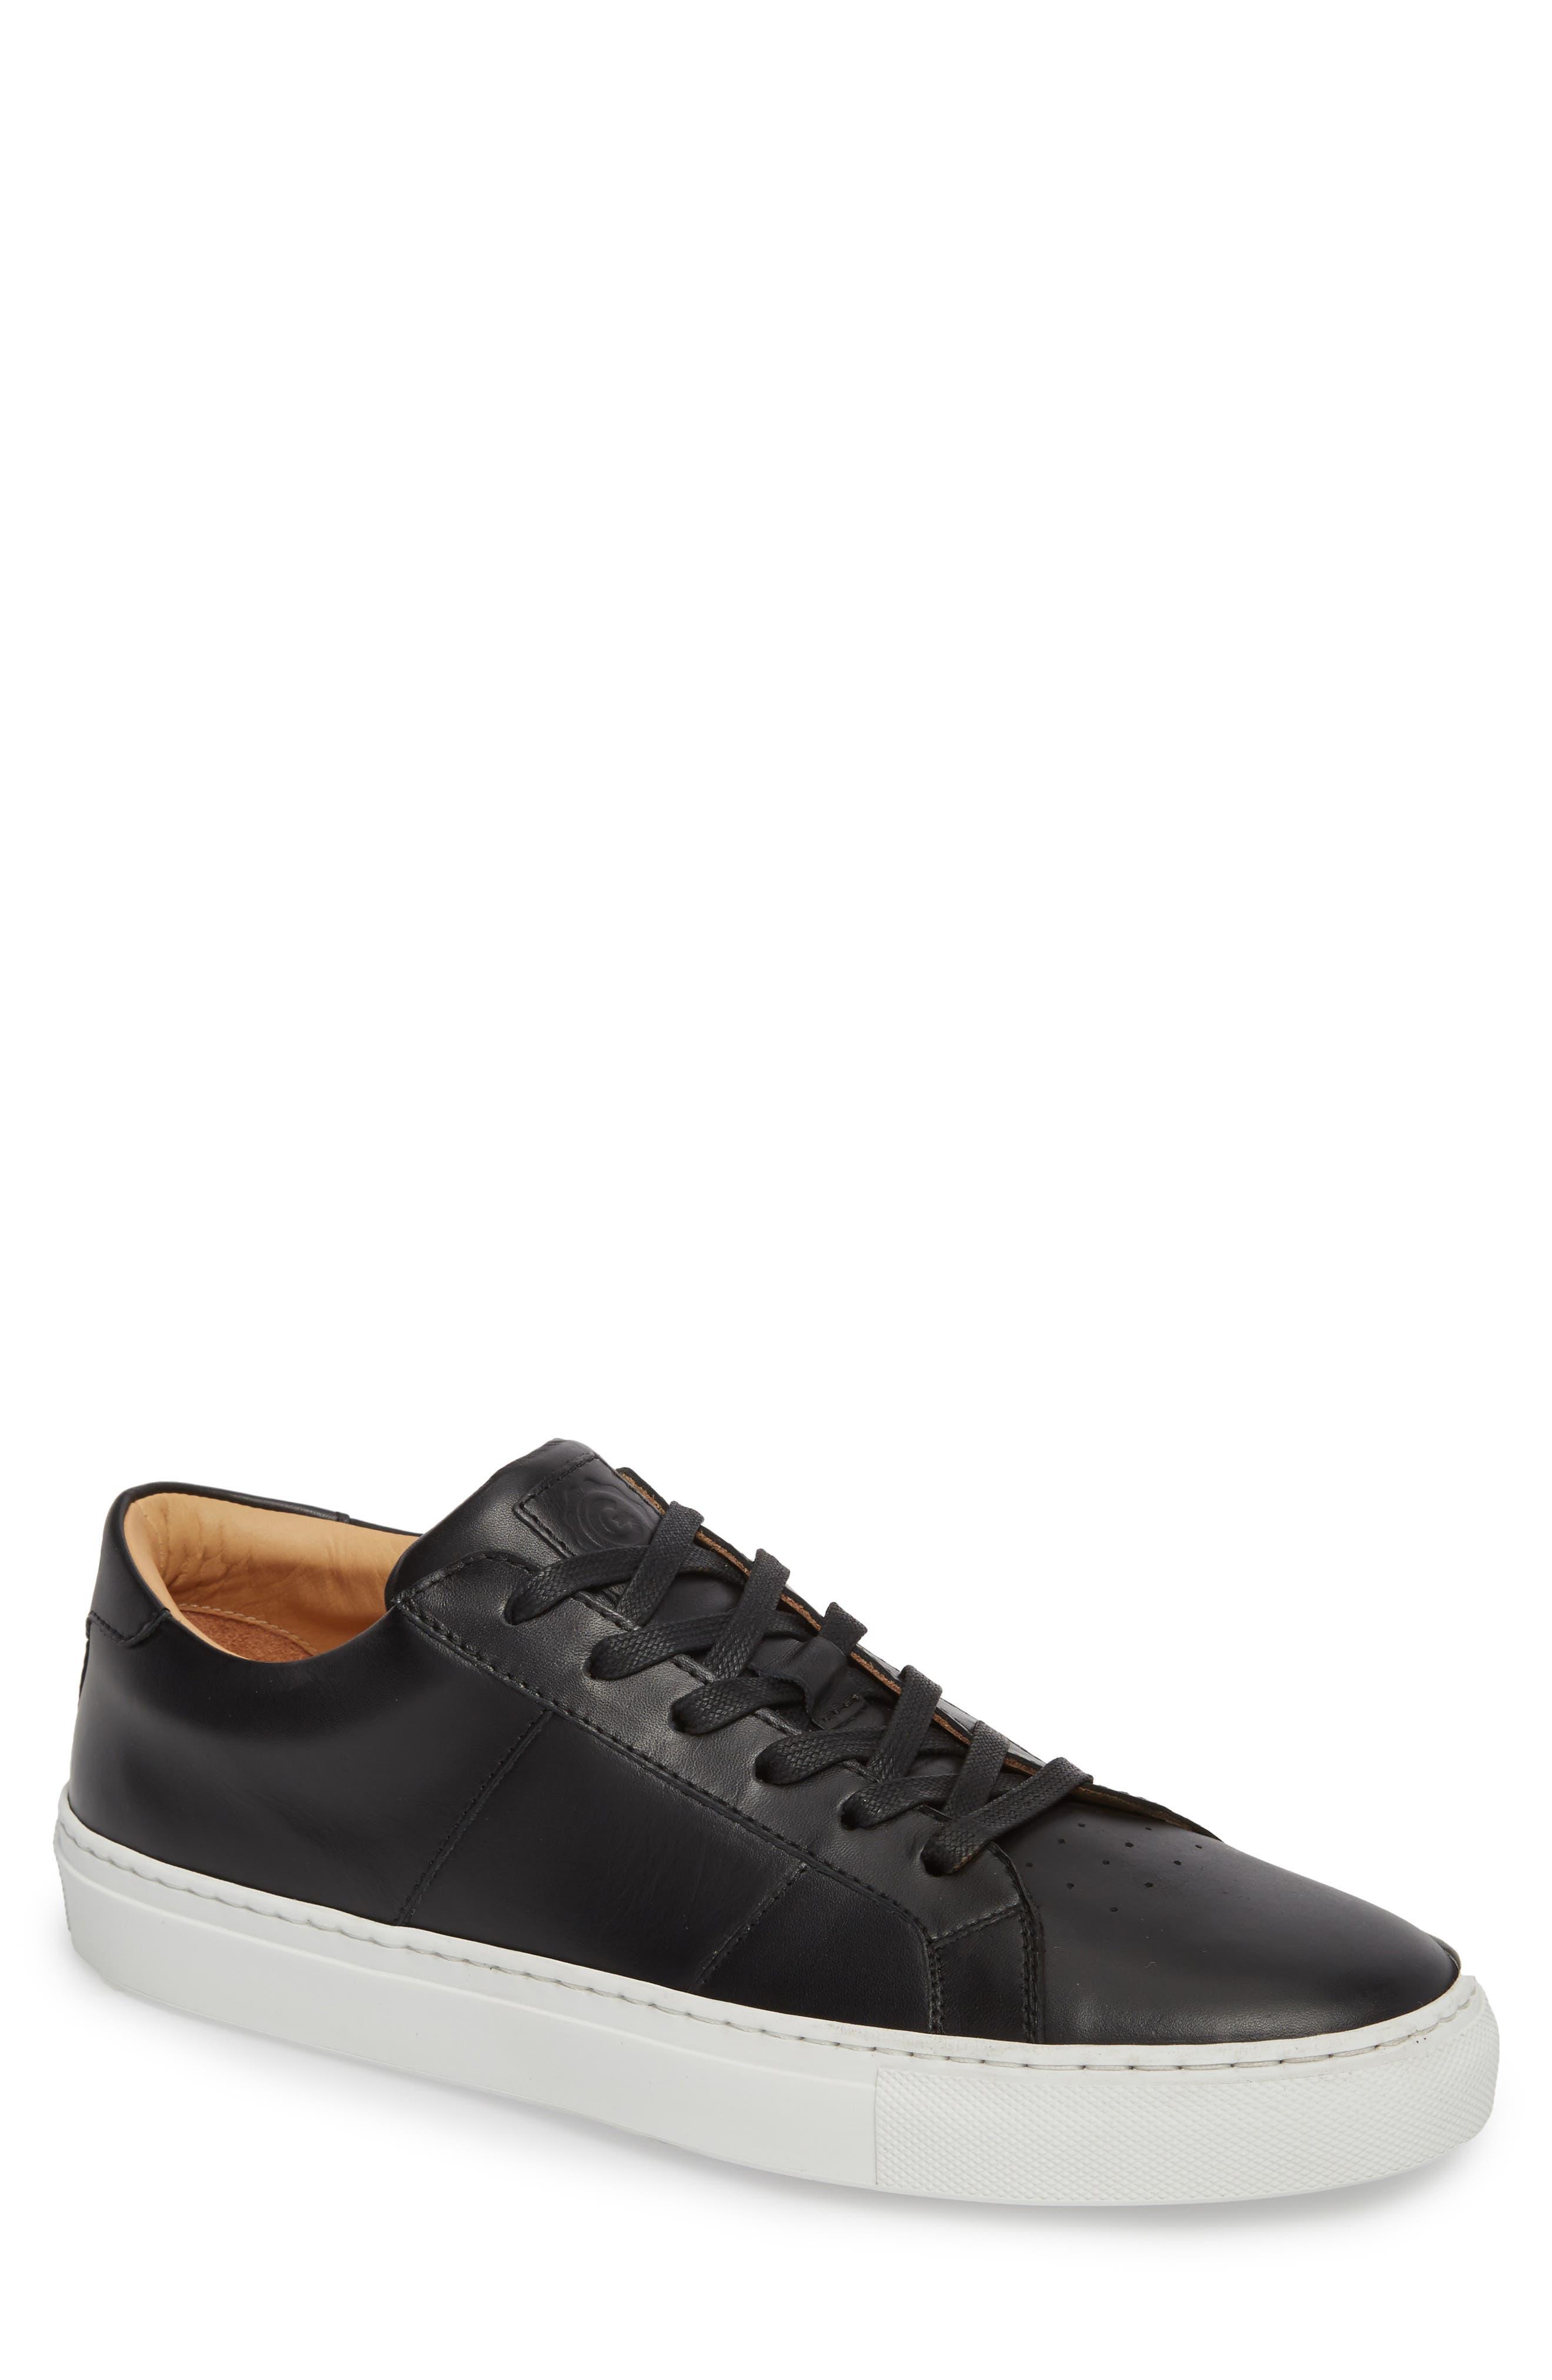 GREATS Royale Sneaker, Main, color, 001